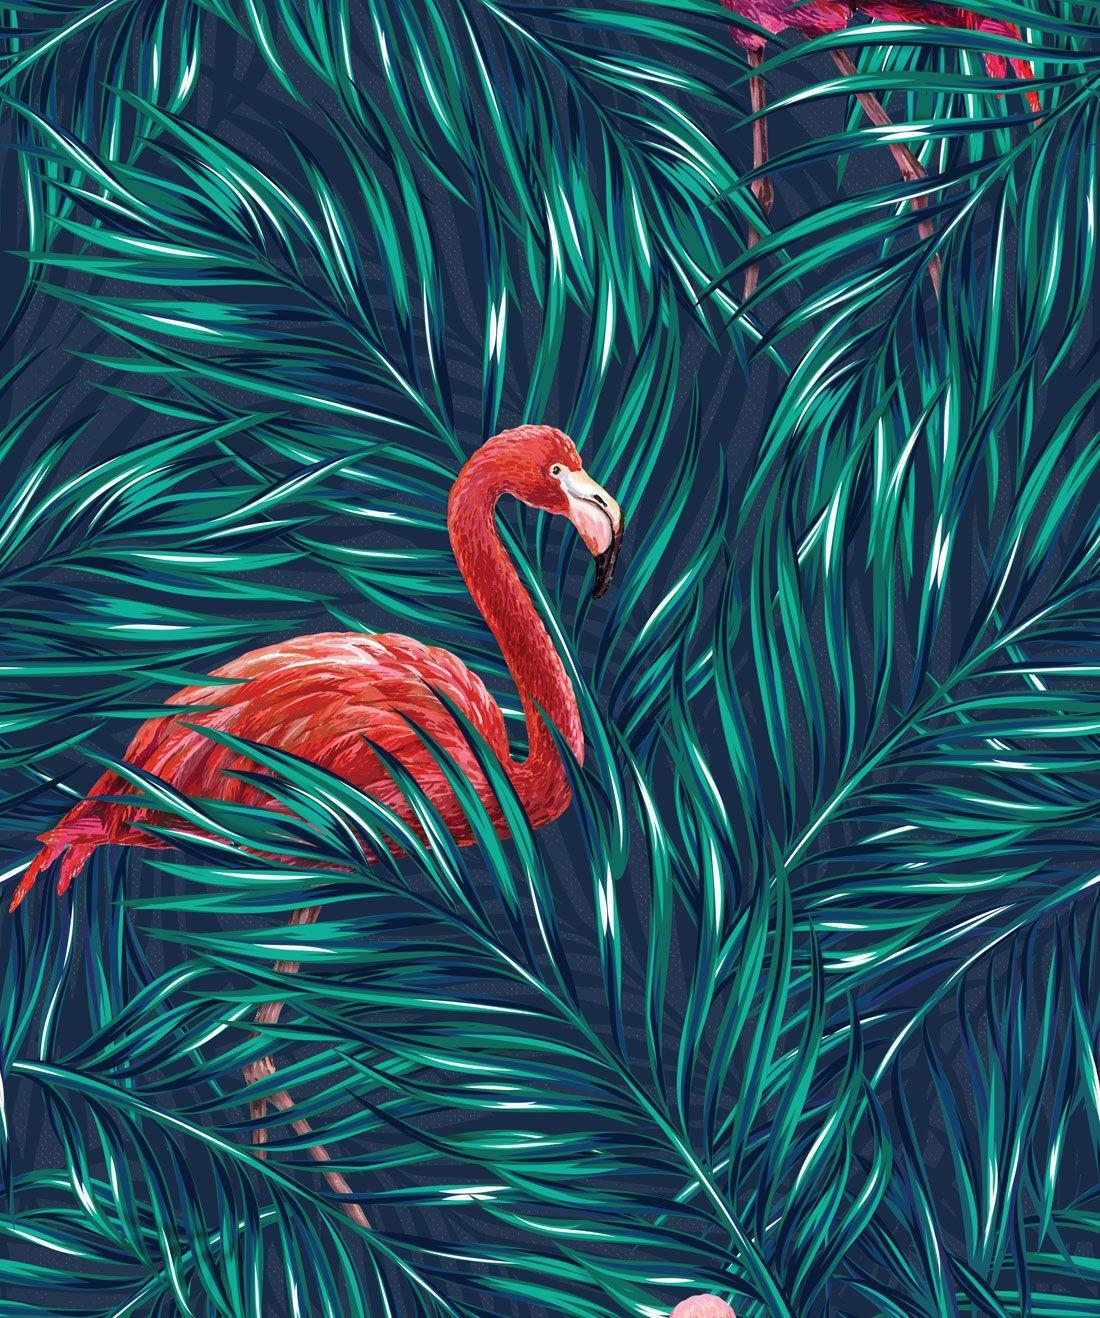 Tropical Flamingo Phone Wallpapers Top Free Tropical Flamingo